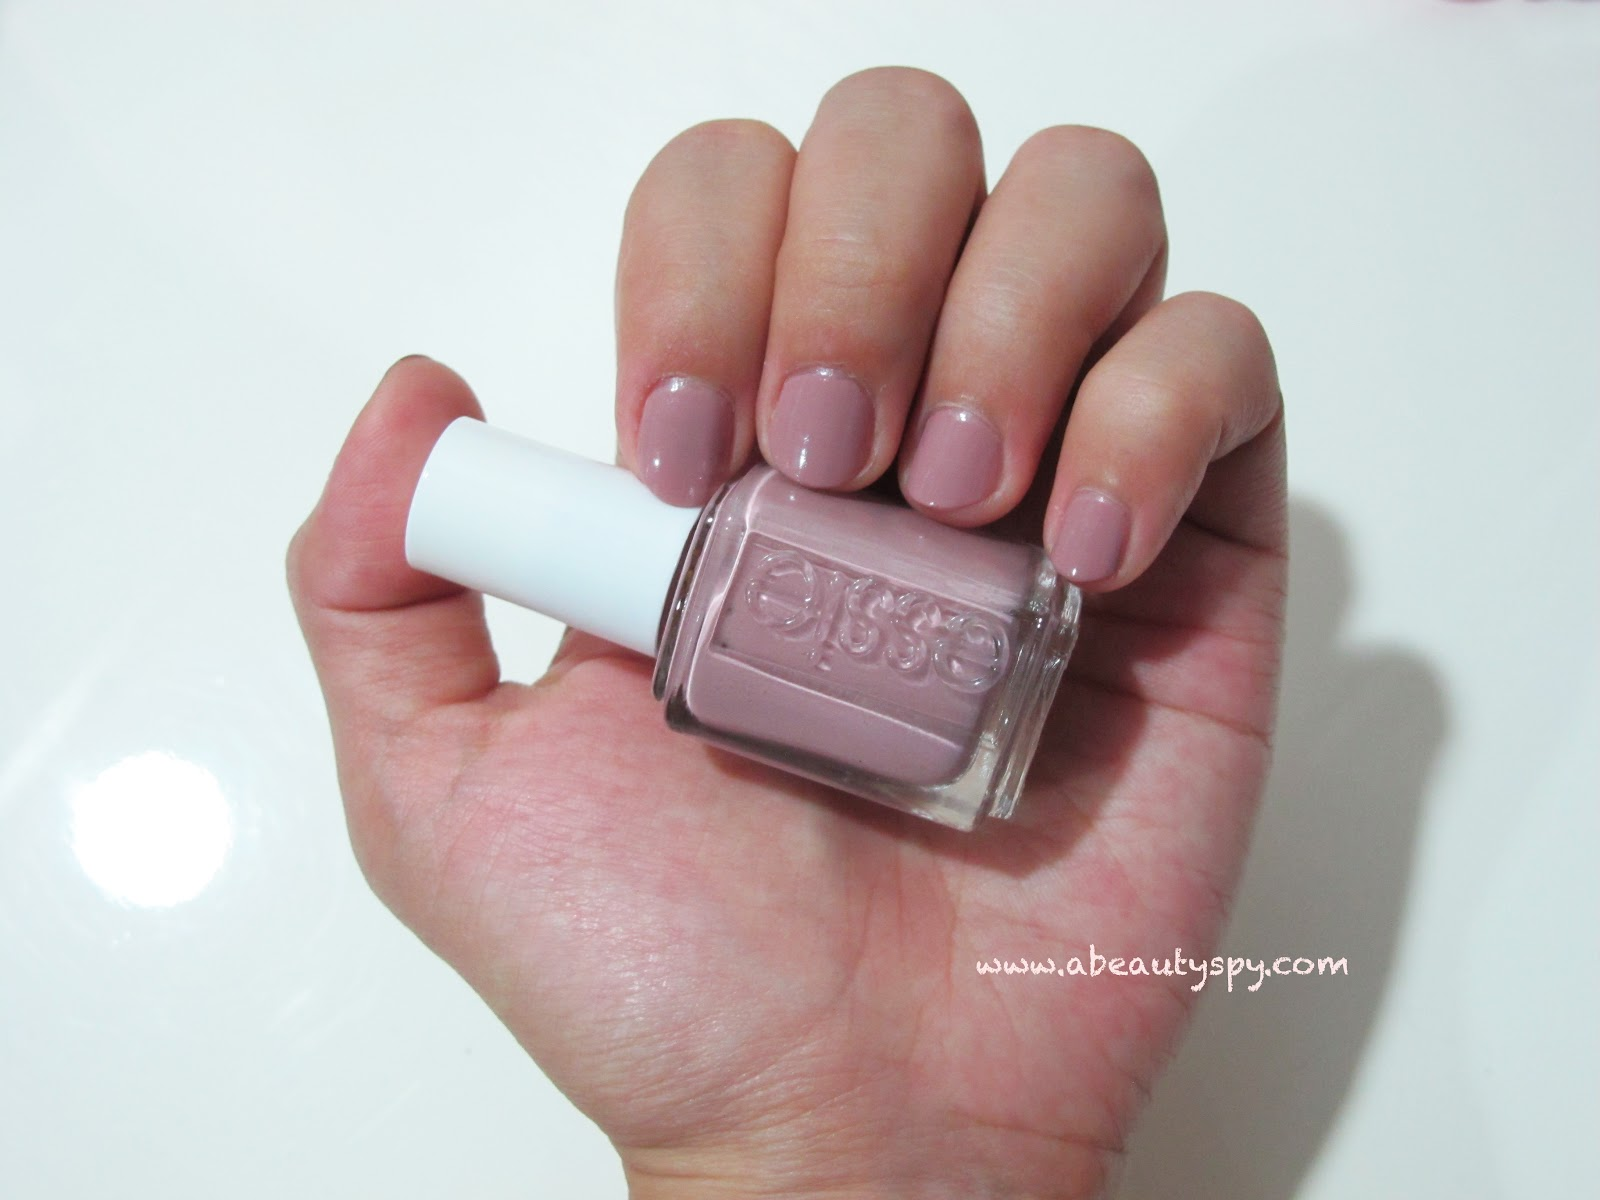 Beauty spy com neutral nail color for job interviews essie lady